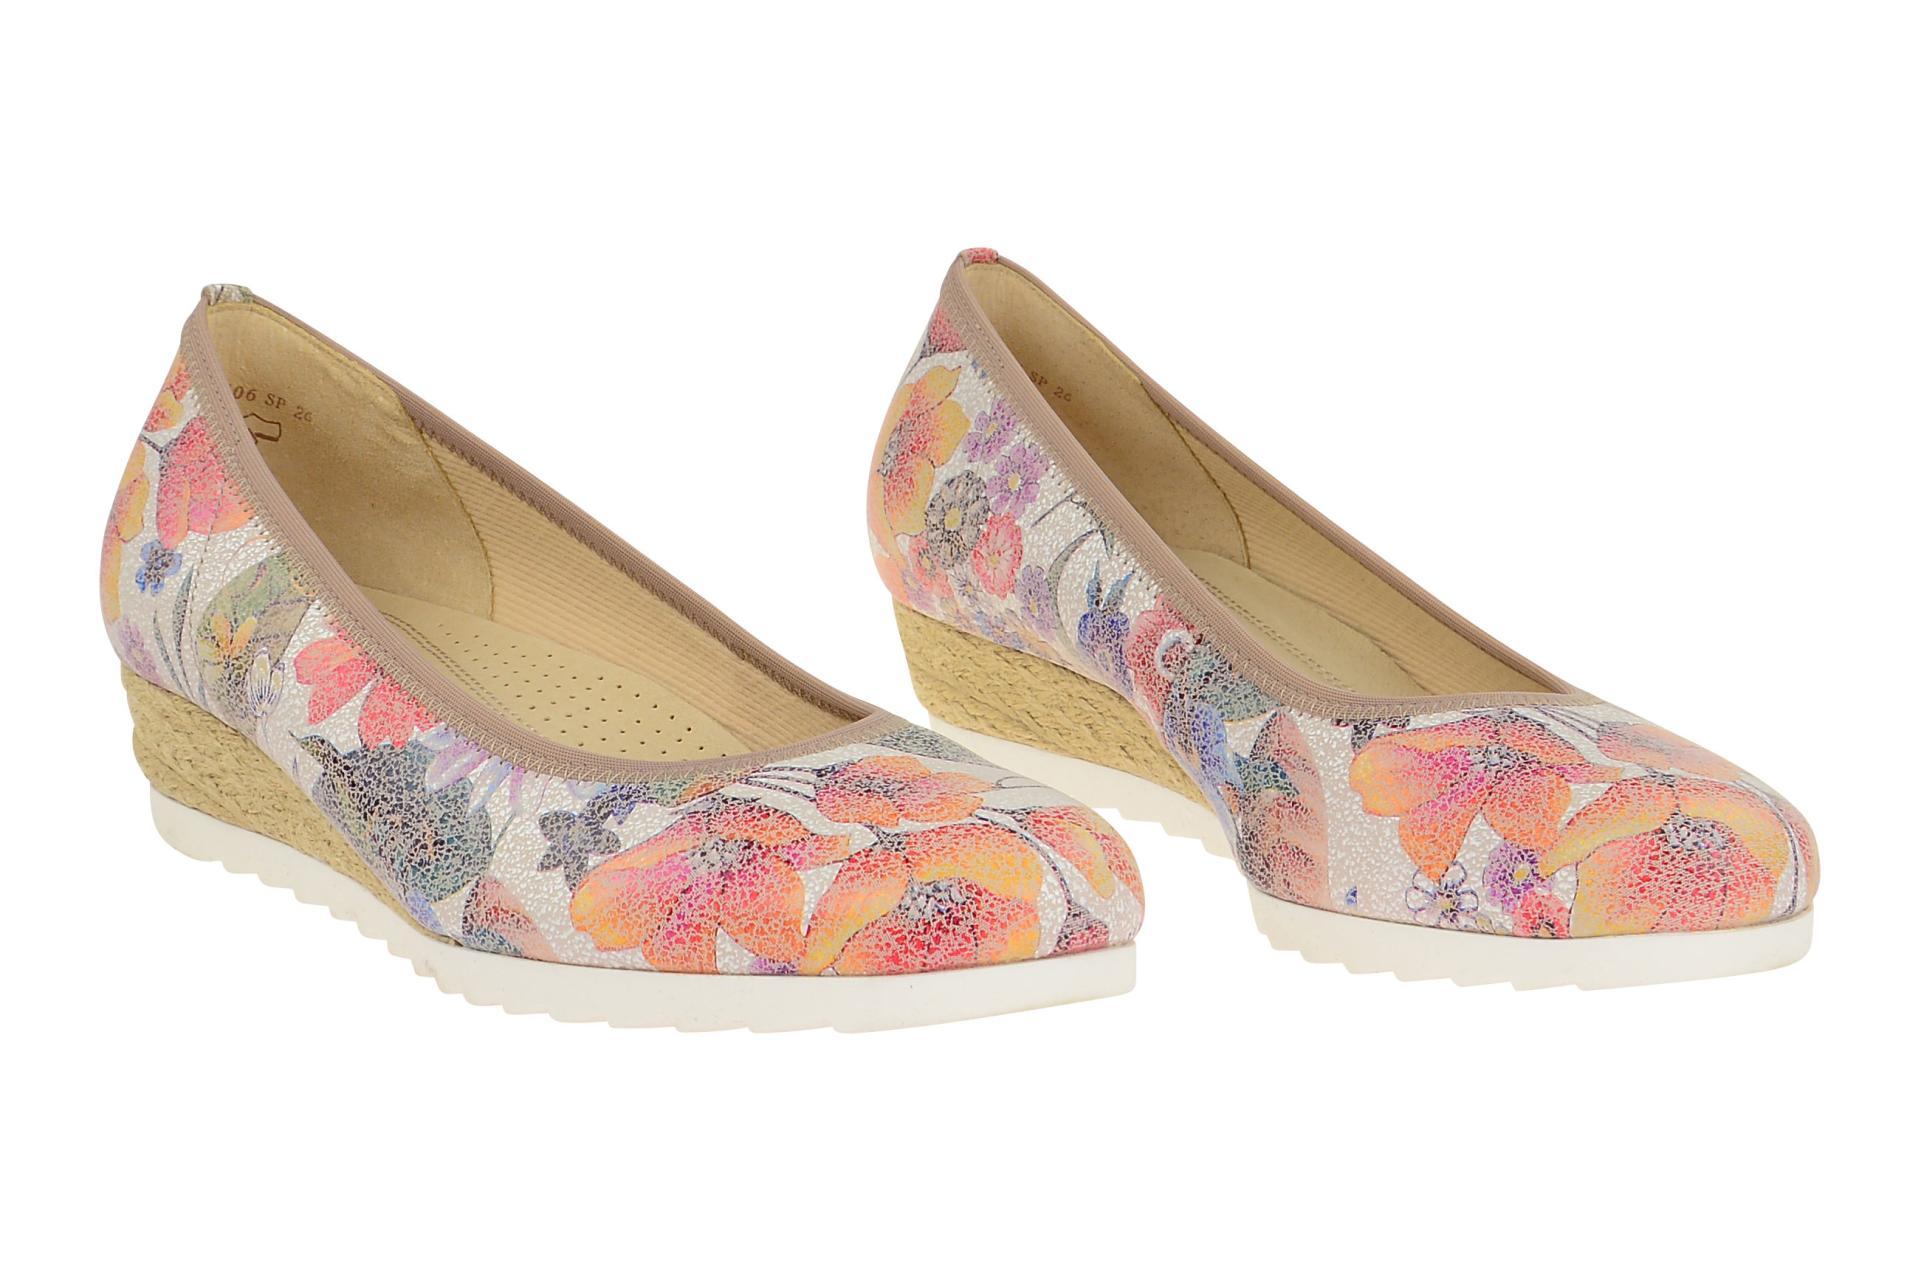 09f1ef86a7 Gabor Schuhe GENUA mehrfarbig Ballerinas Damen Halbschuhe 62.641.40 NEU